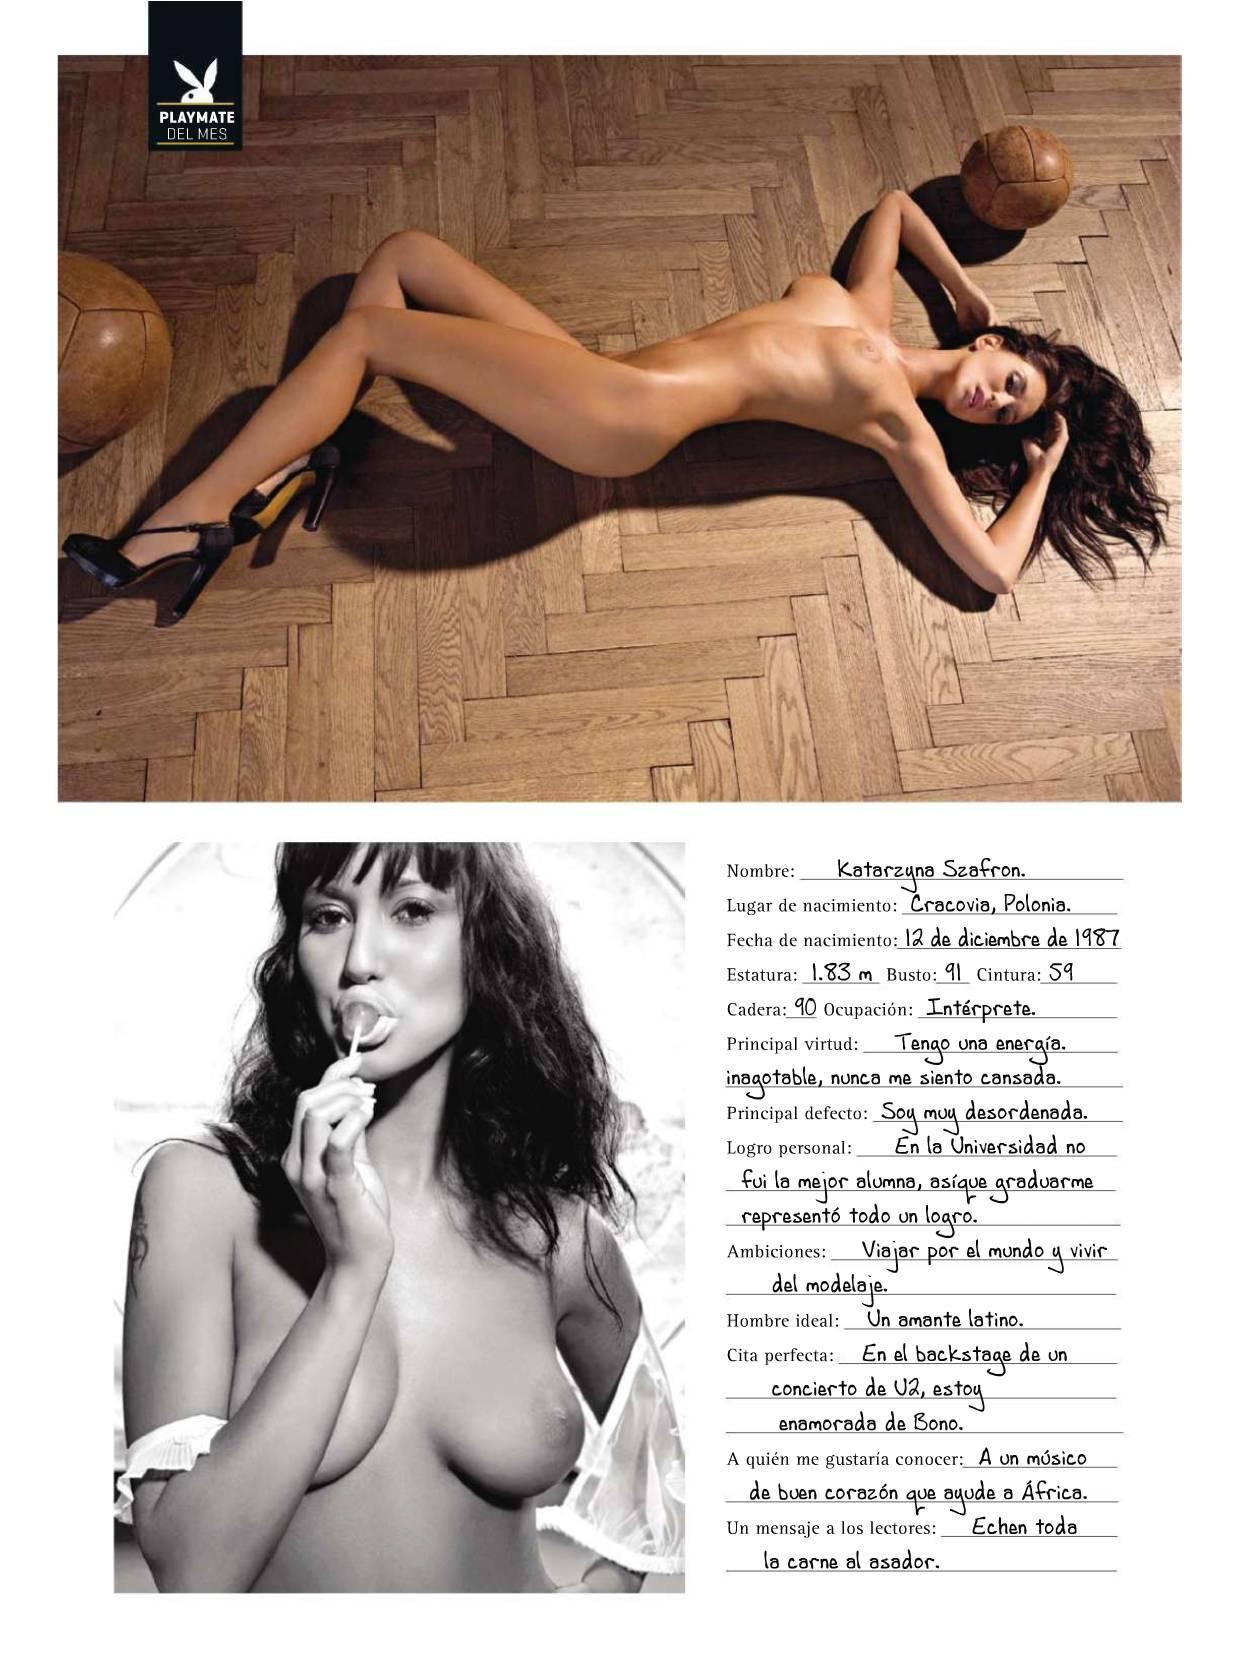 14840_septimiu29_KatarzynaSzafron_PlayboyMexico_August201015_123_176lo.jpg